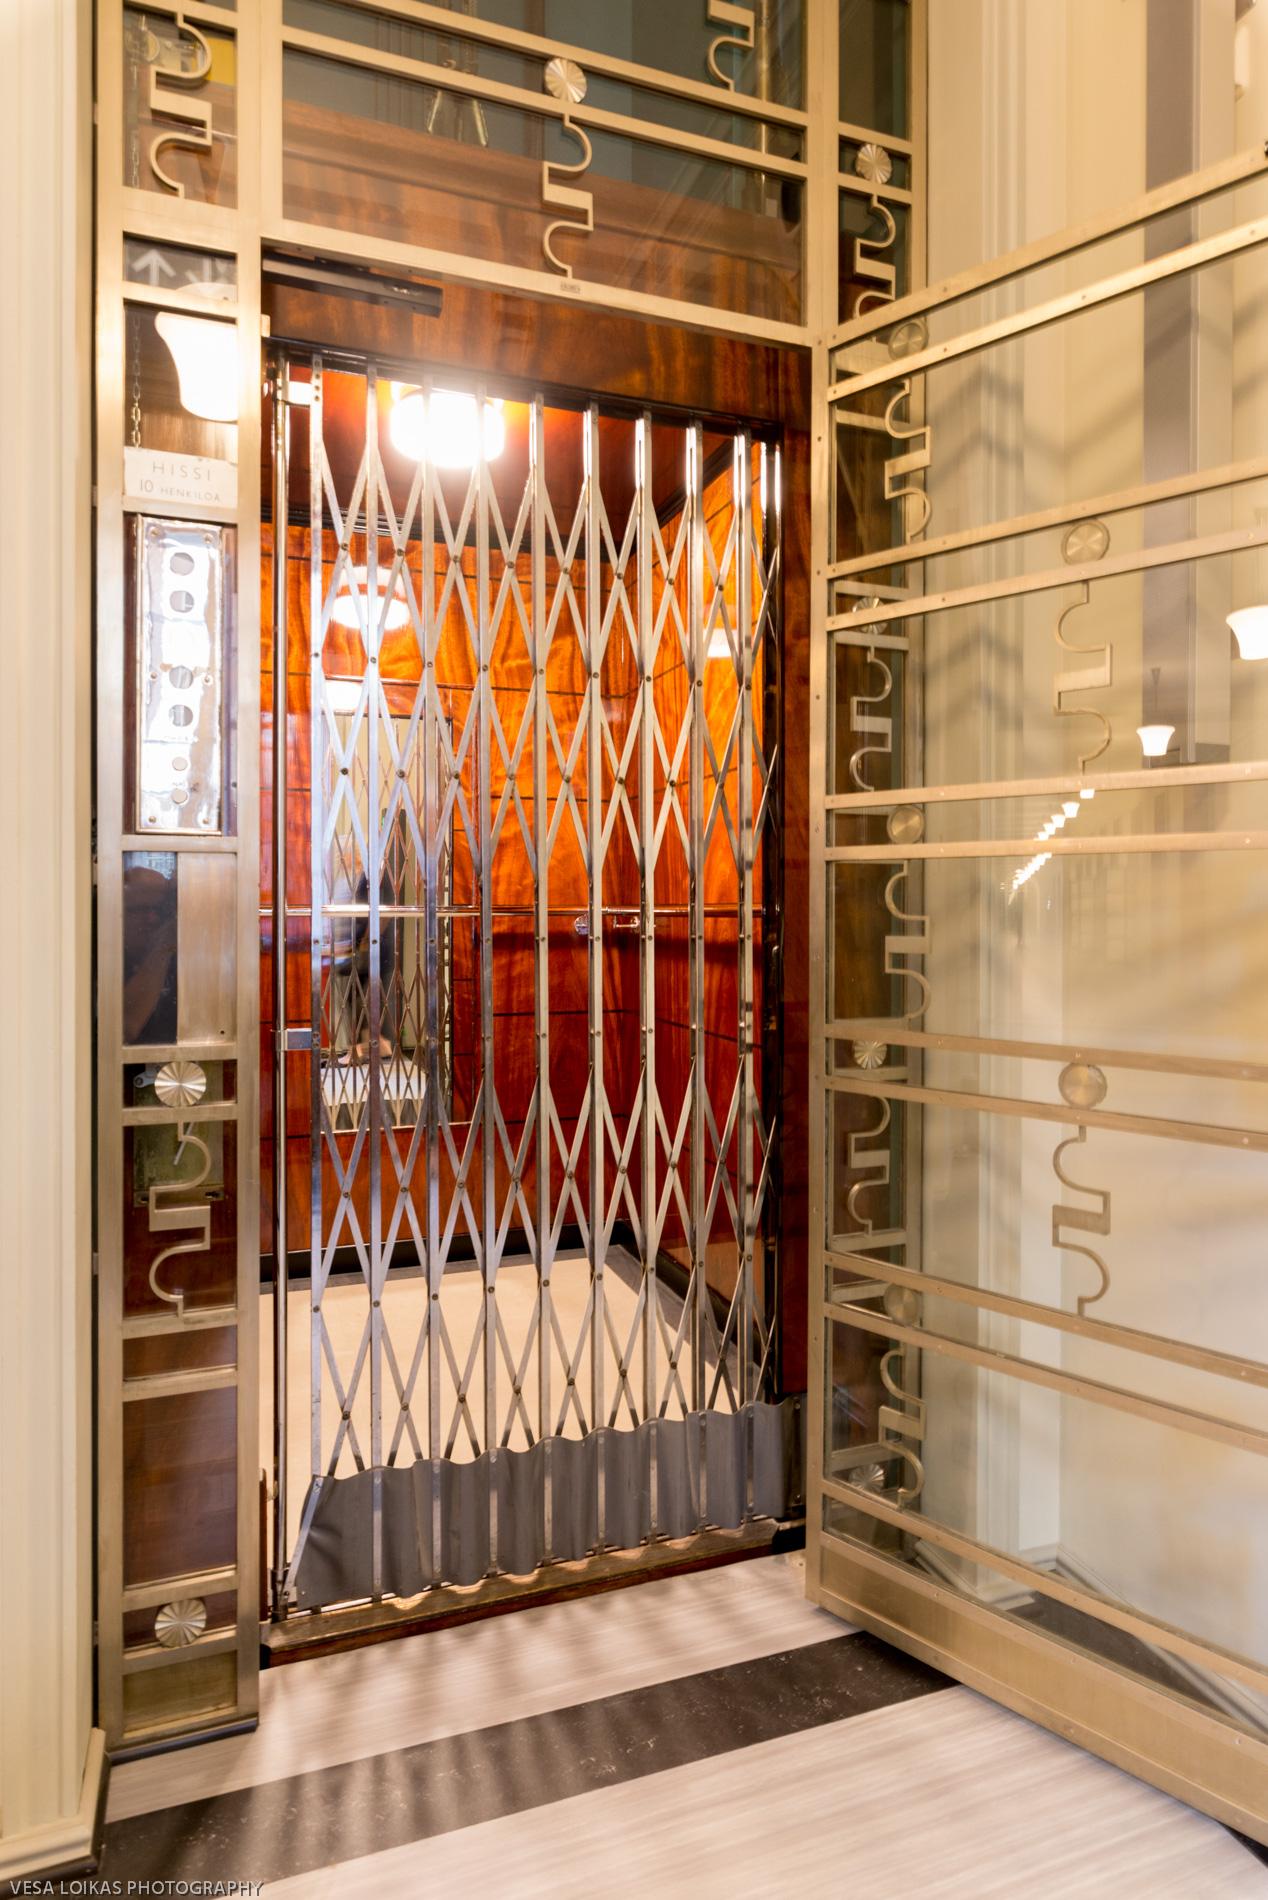 Decorative elevator doors and interiors.